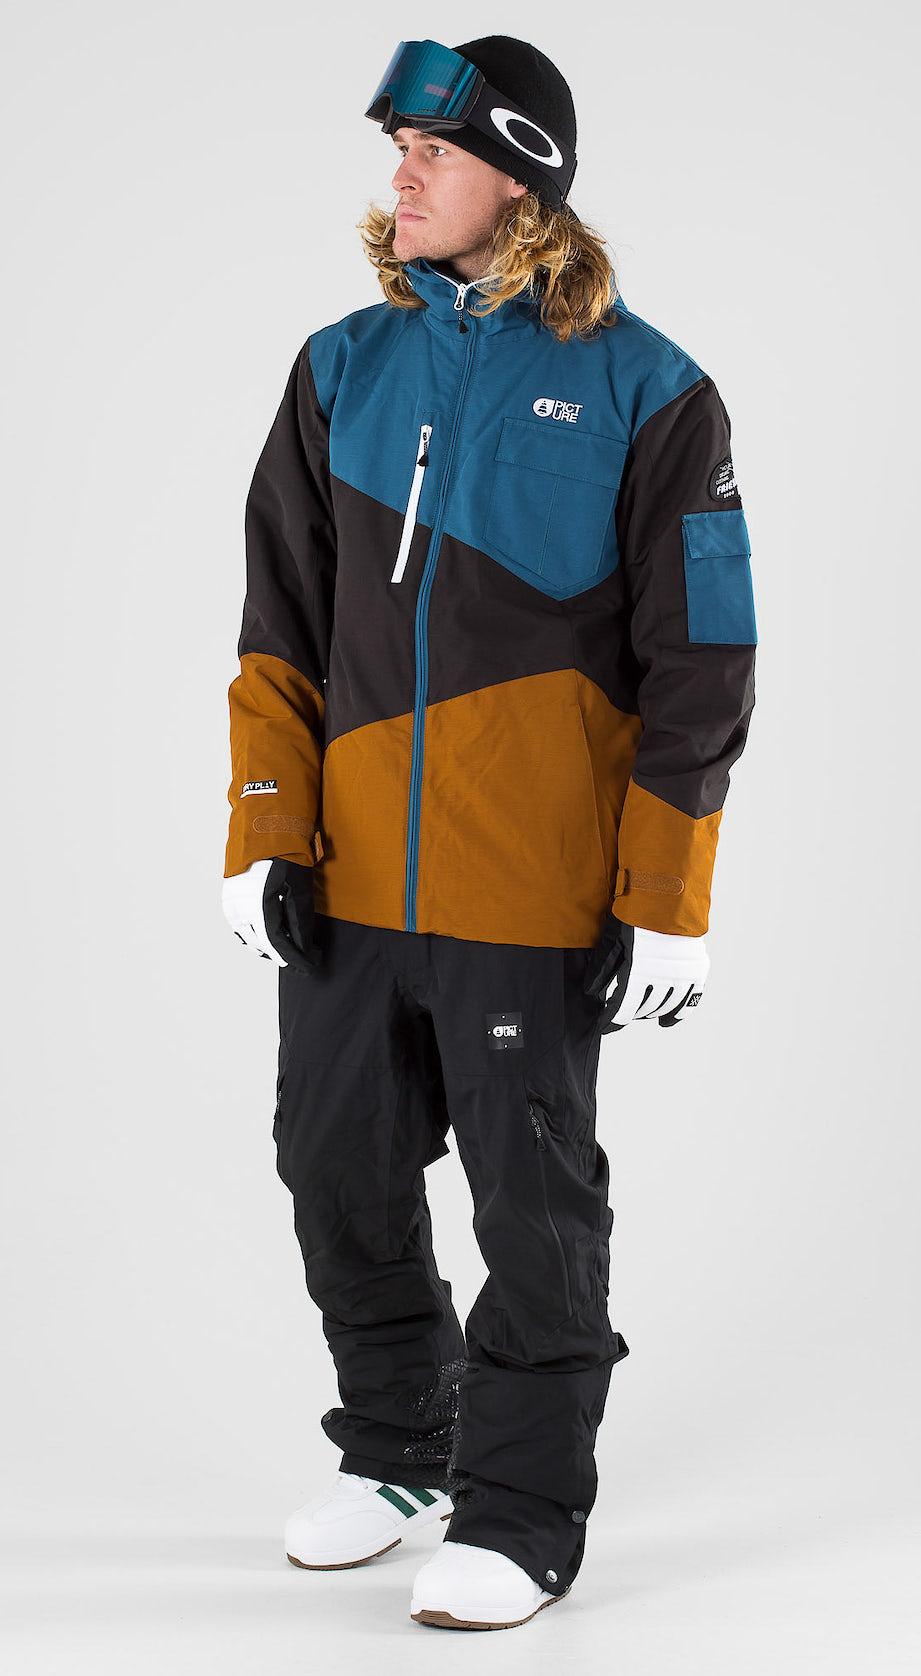 Picture Styler Camel Snowboardkläder Multi